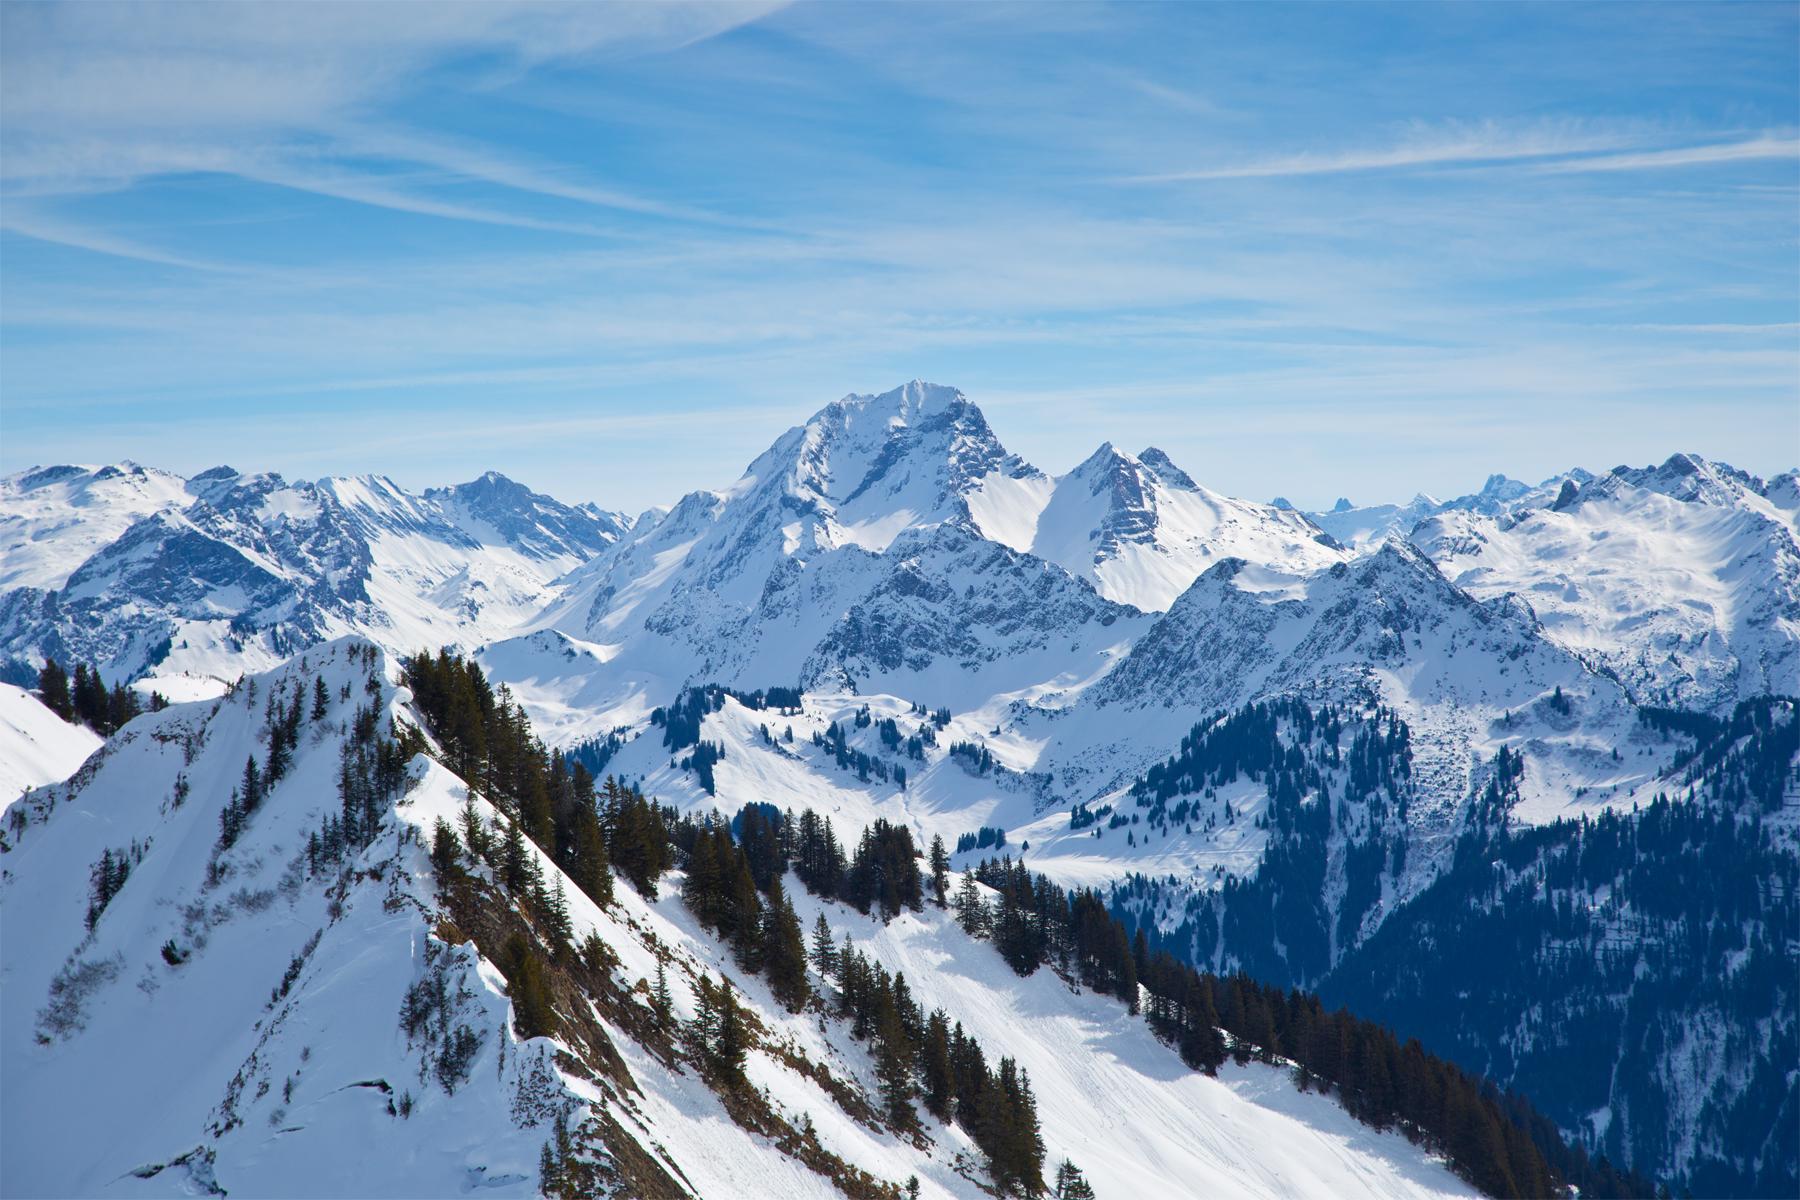 Markanteste Berg des Lechquellengebirges, Rote Wand